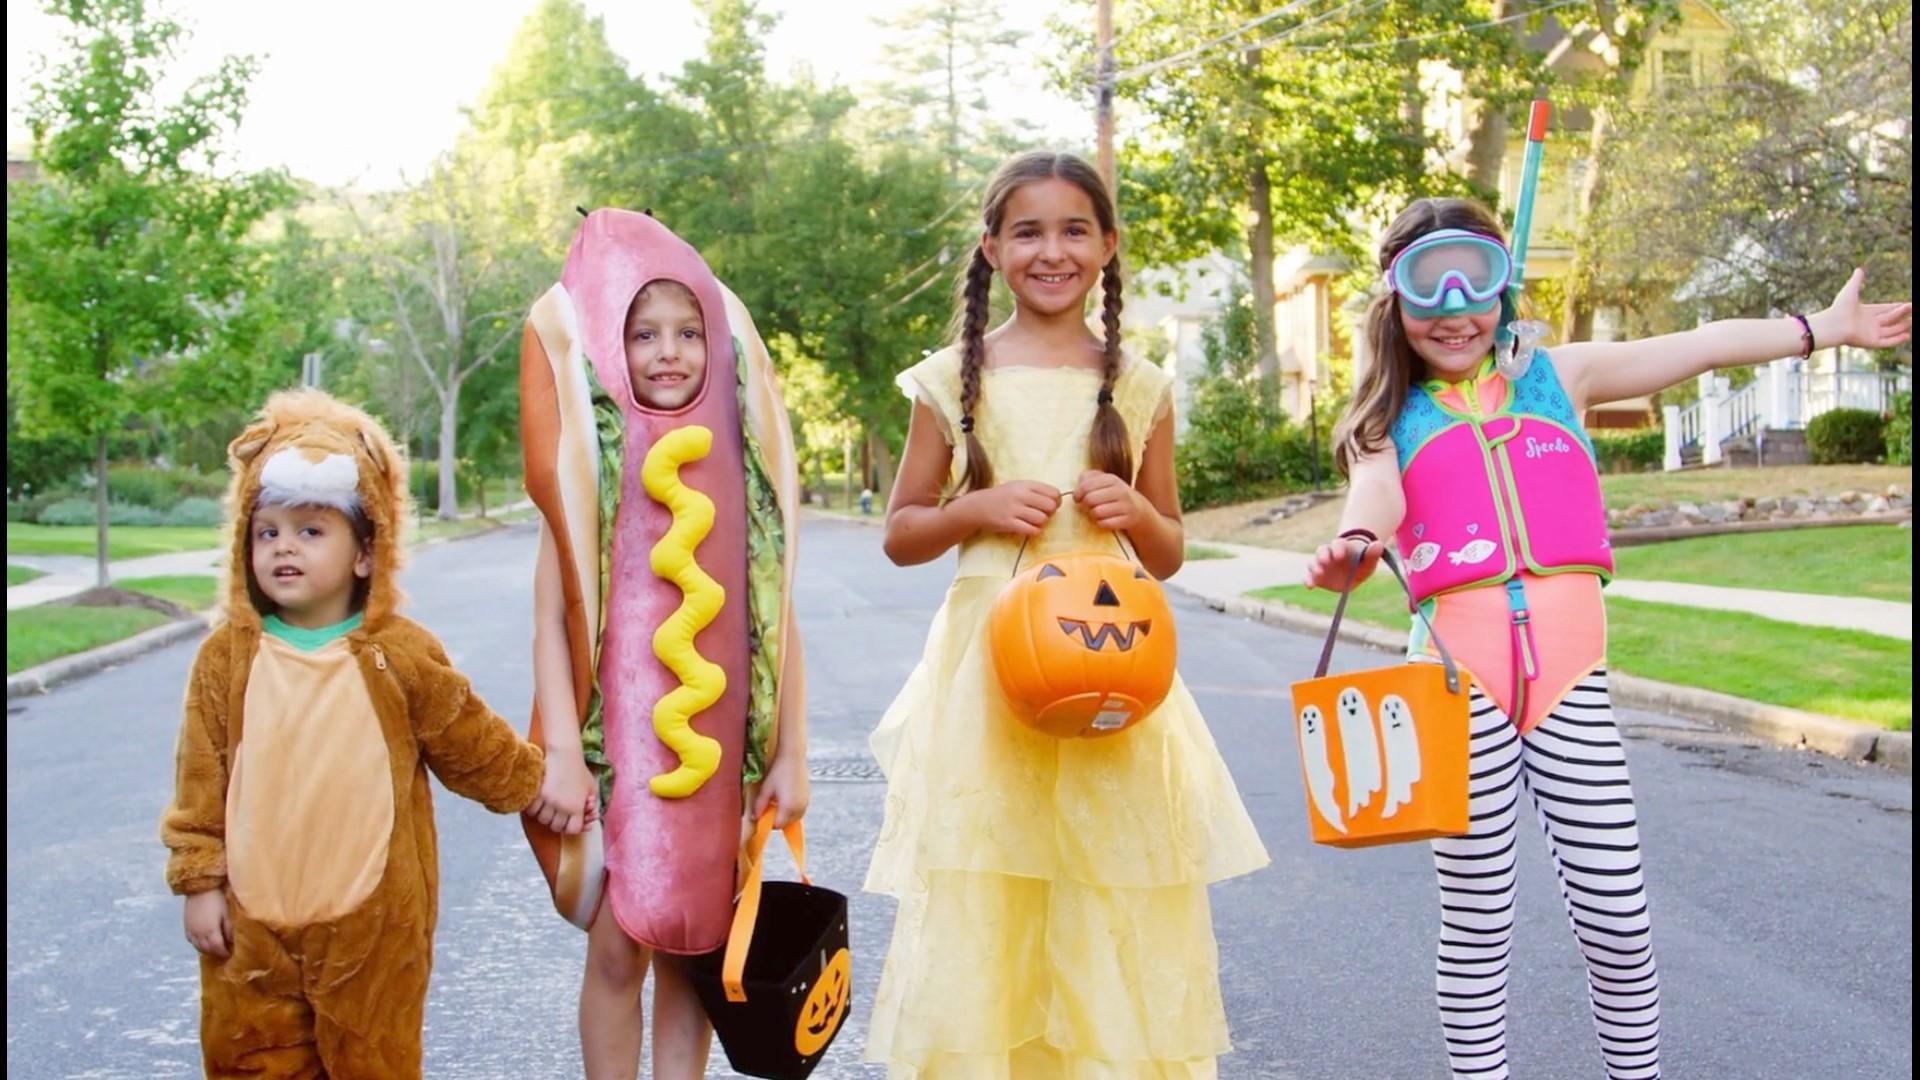 Halloween Events For Kids 2020 In Toledo Toledo news, weather, traffic and sports | Toledo, Ohio, | wtol